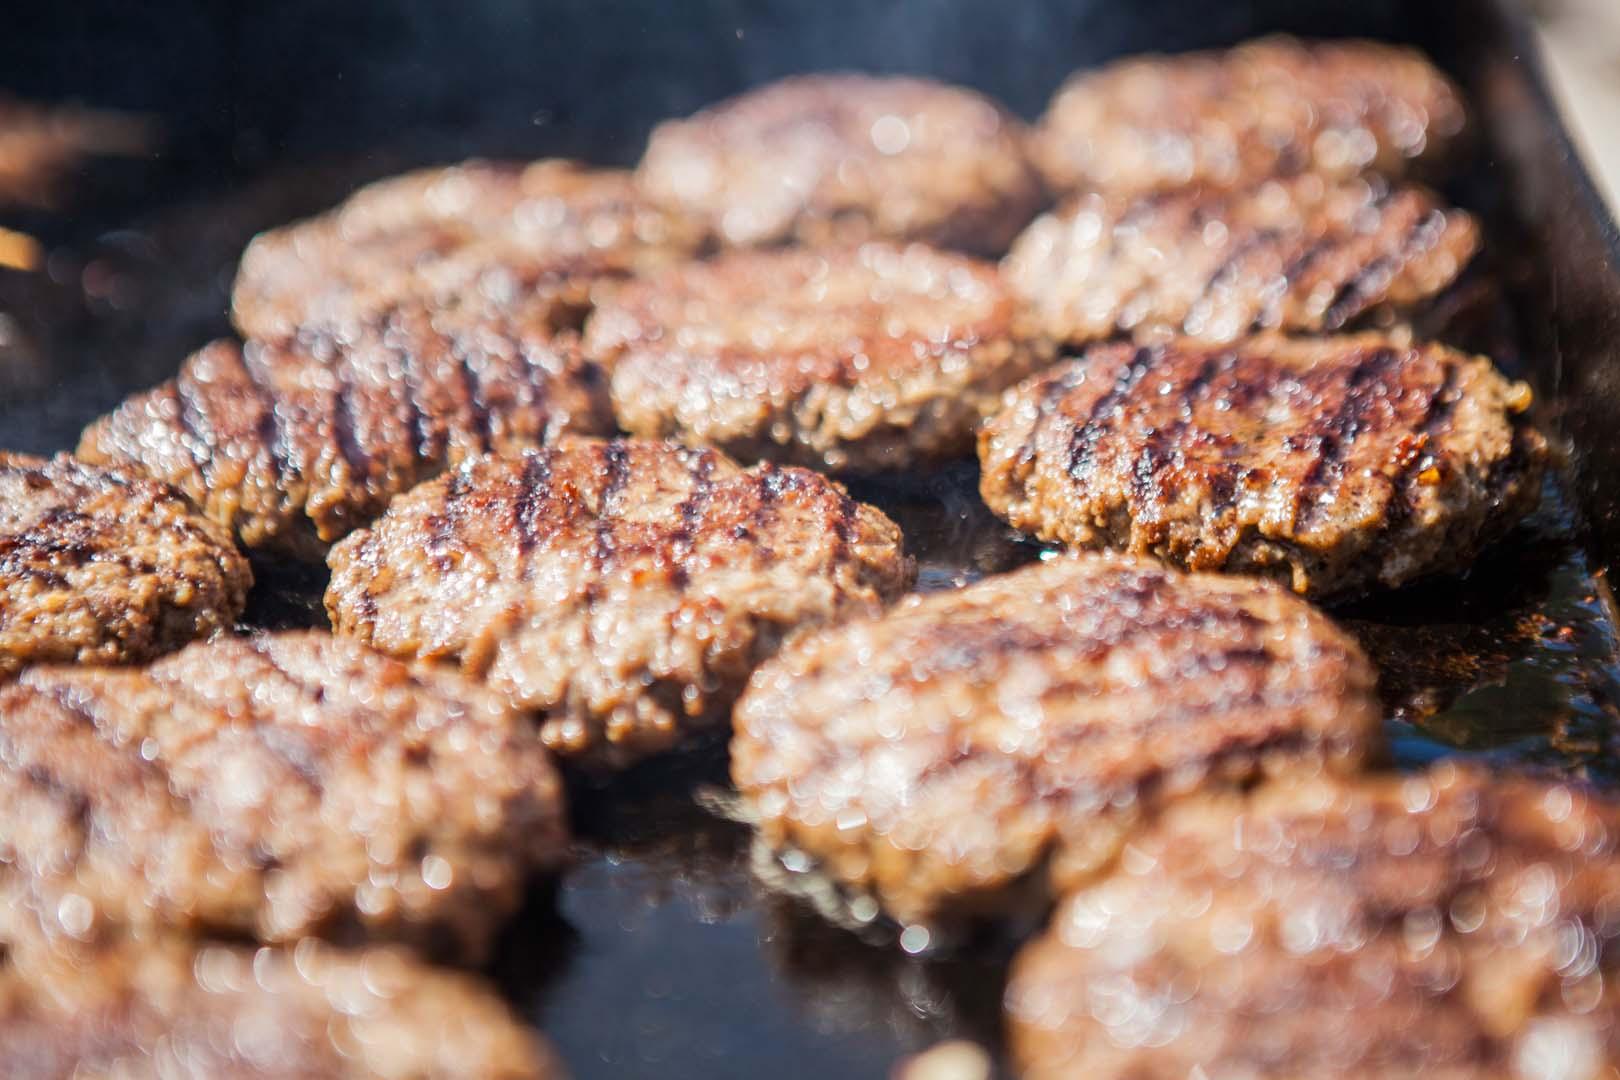 Ridder_Catering_barbecue_bbq_hamburger_hereford_grillburger_2